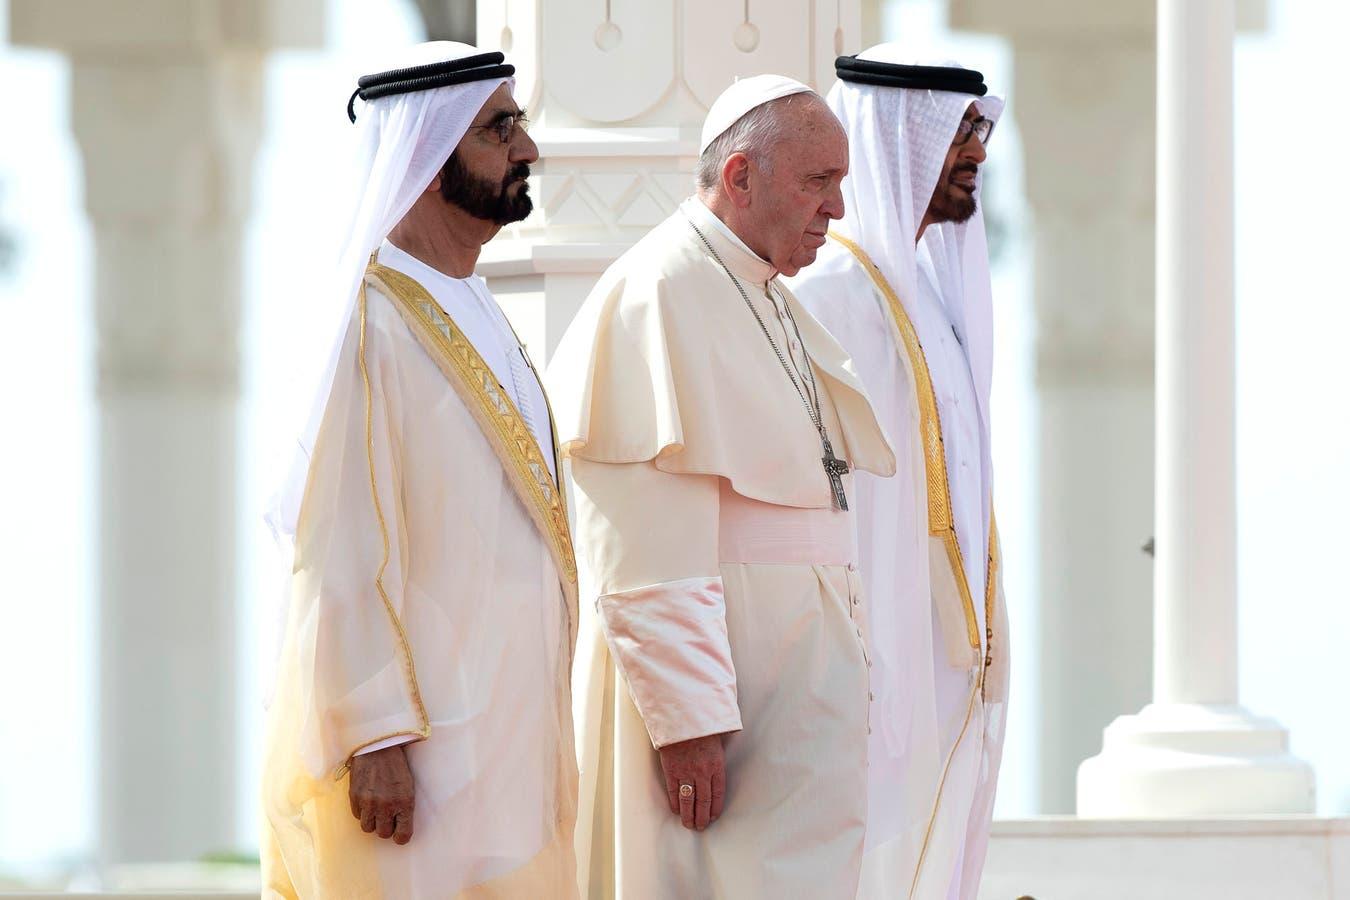 El Papa Francisco junto a Sheikh Mohammed bin Rashid Al-Maktoum y el Principe de Abu Dhabi, Mohammed bin Zayed al-Nahyan.